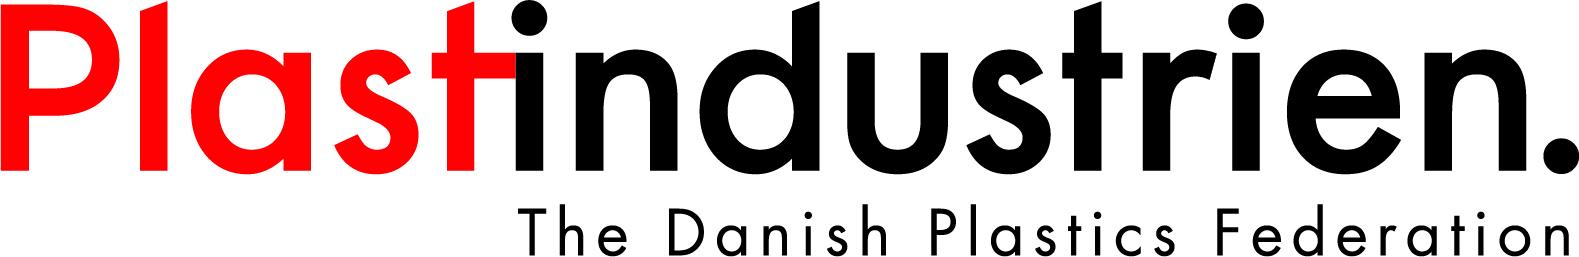 https://europeanplasticspact.org/wp-content/uploads/2020/03/The-Danish-Plastics-Federation.jpg